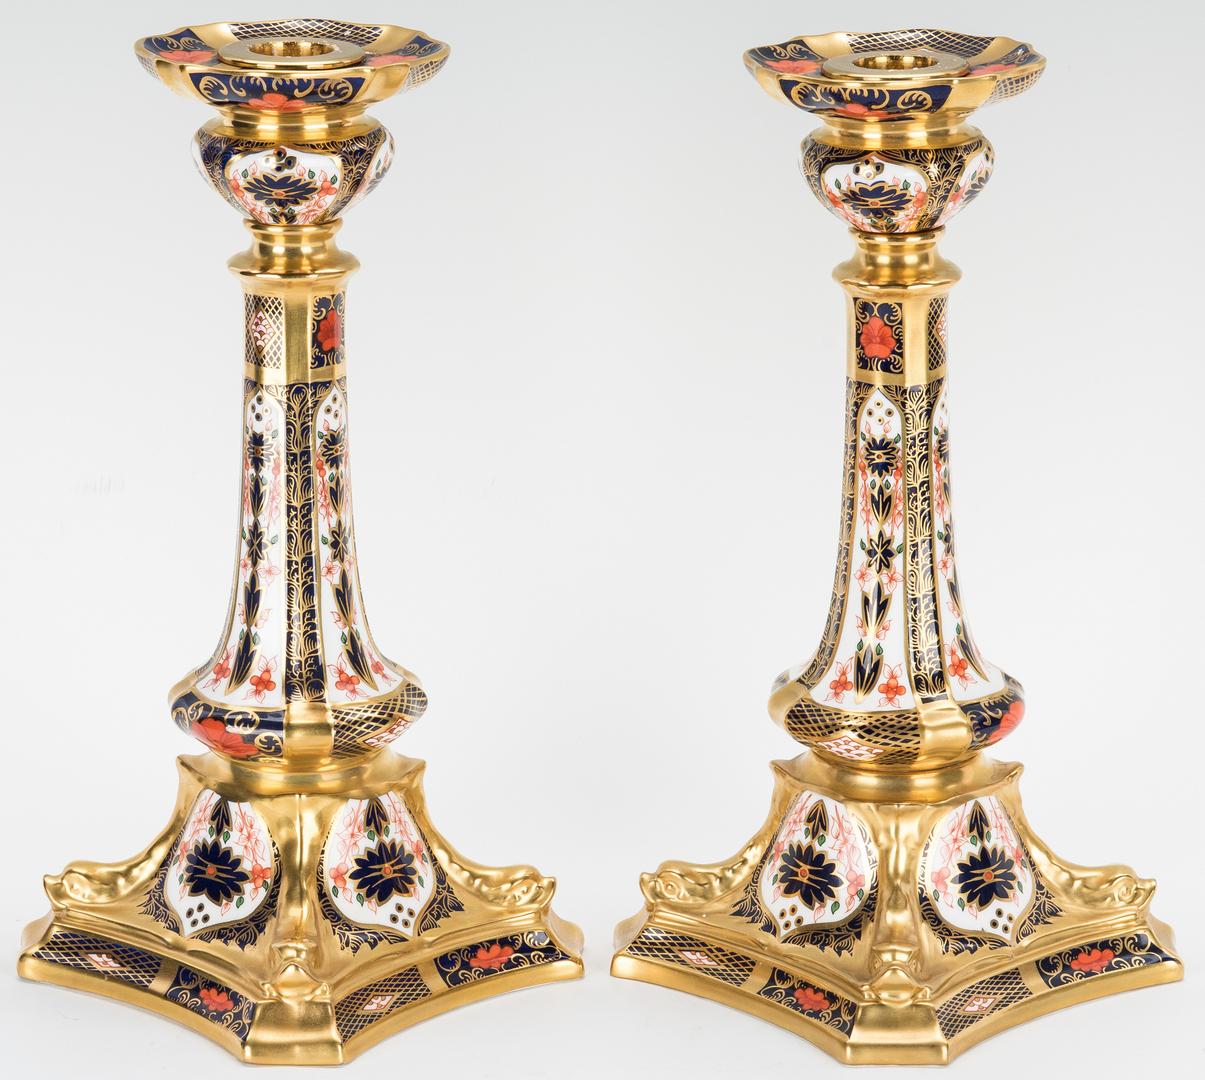 Lot 250: 63 Pcs. Royal Crown Derby Imari Porcelain, Cigar Pattern